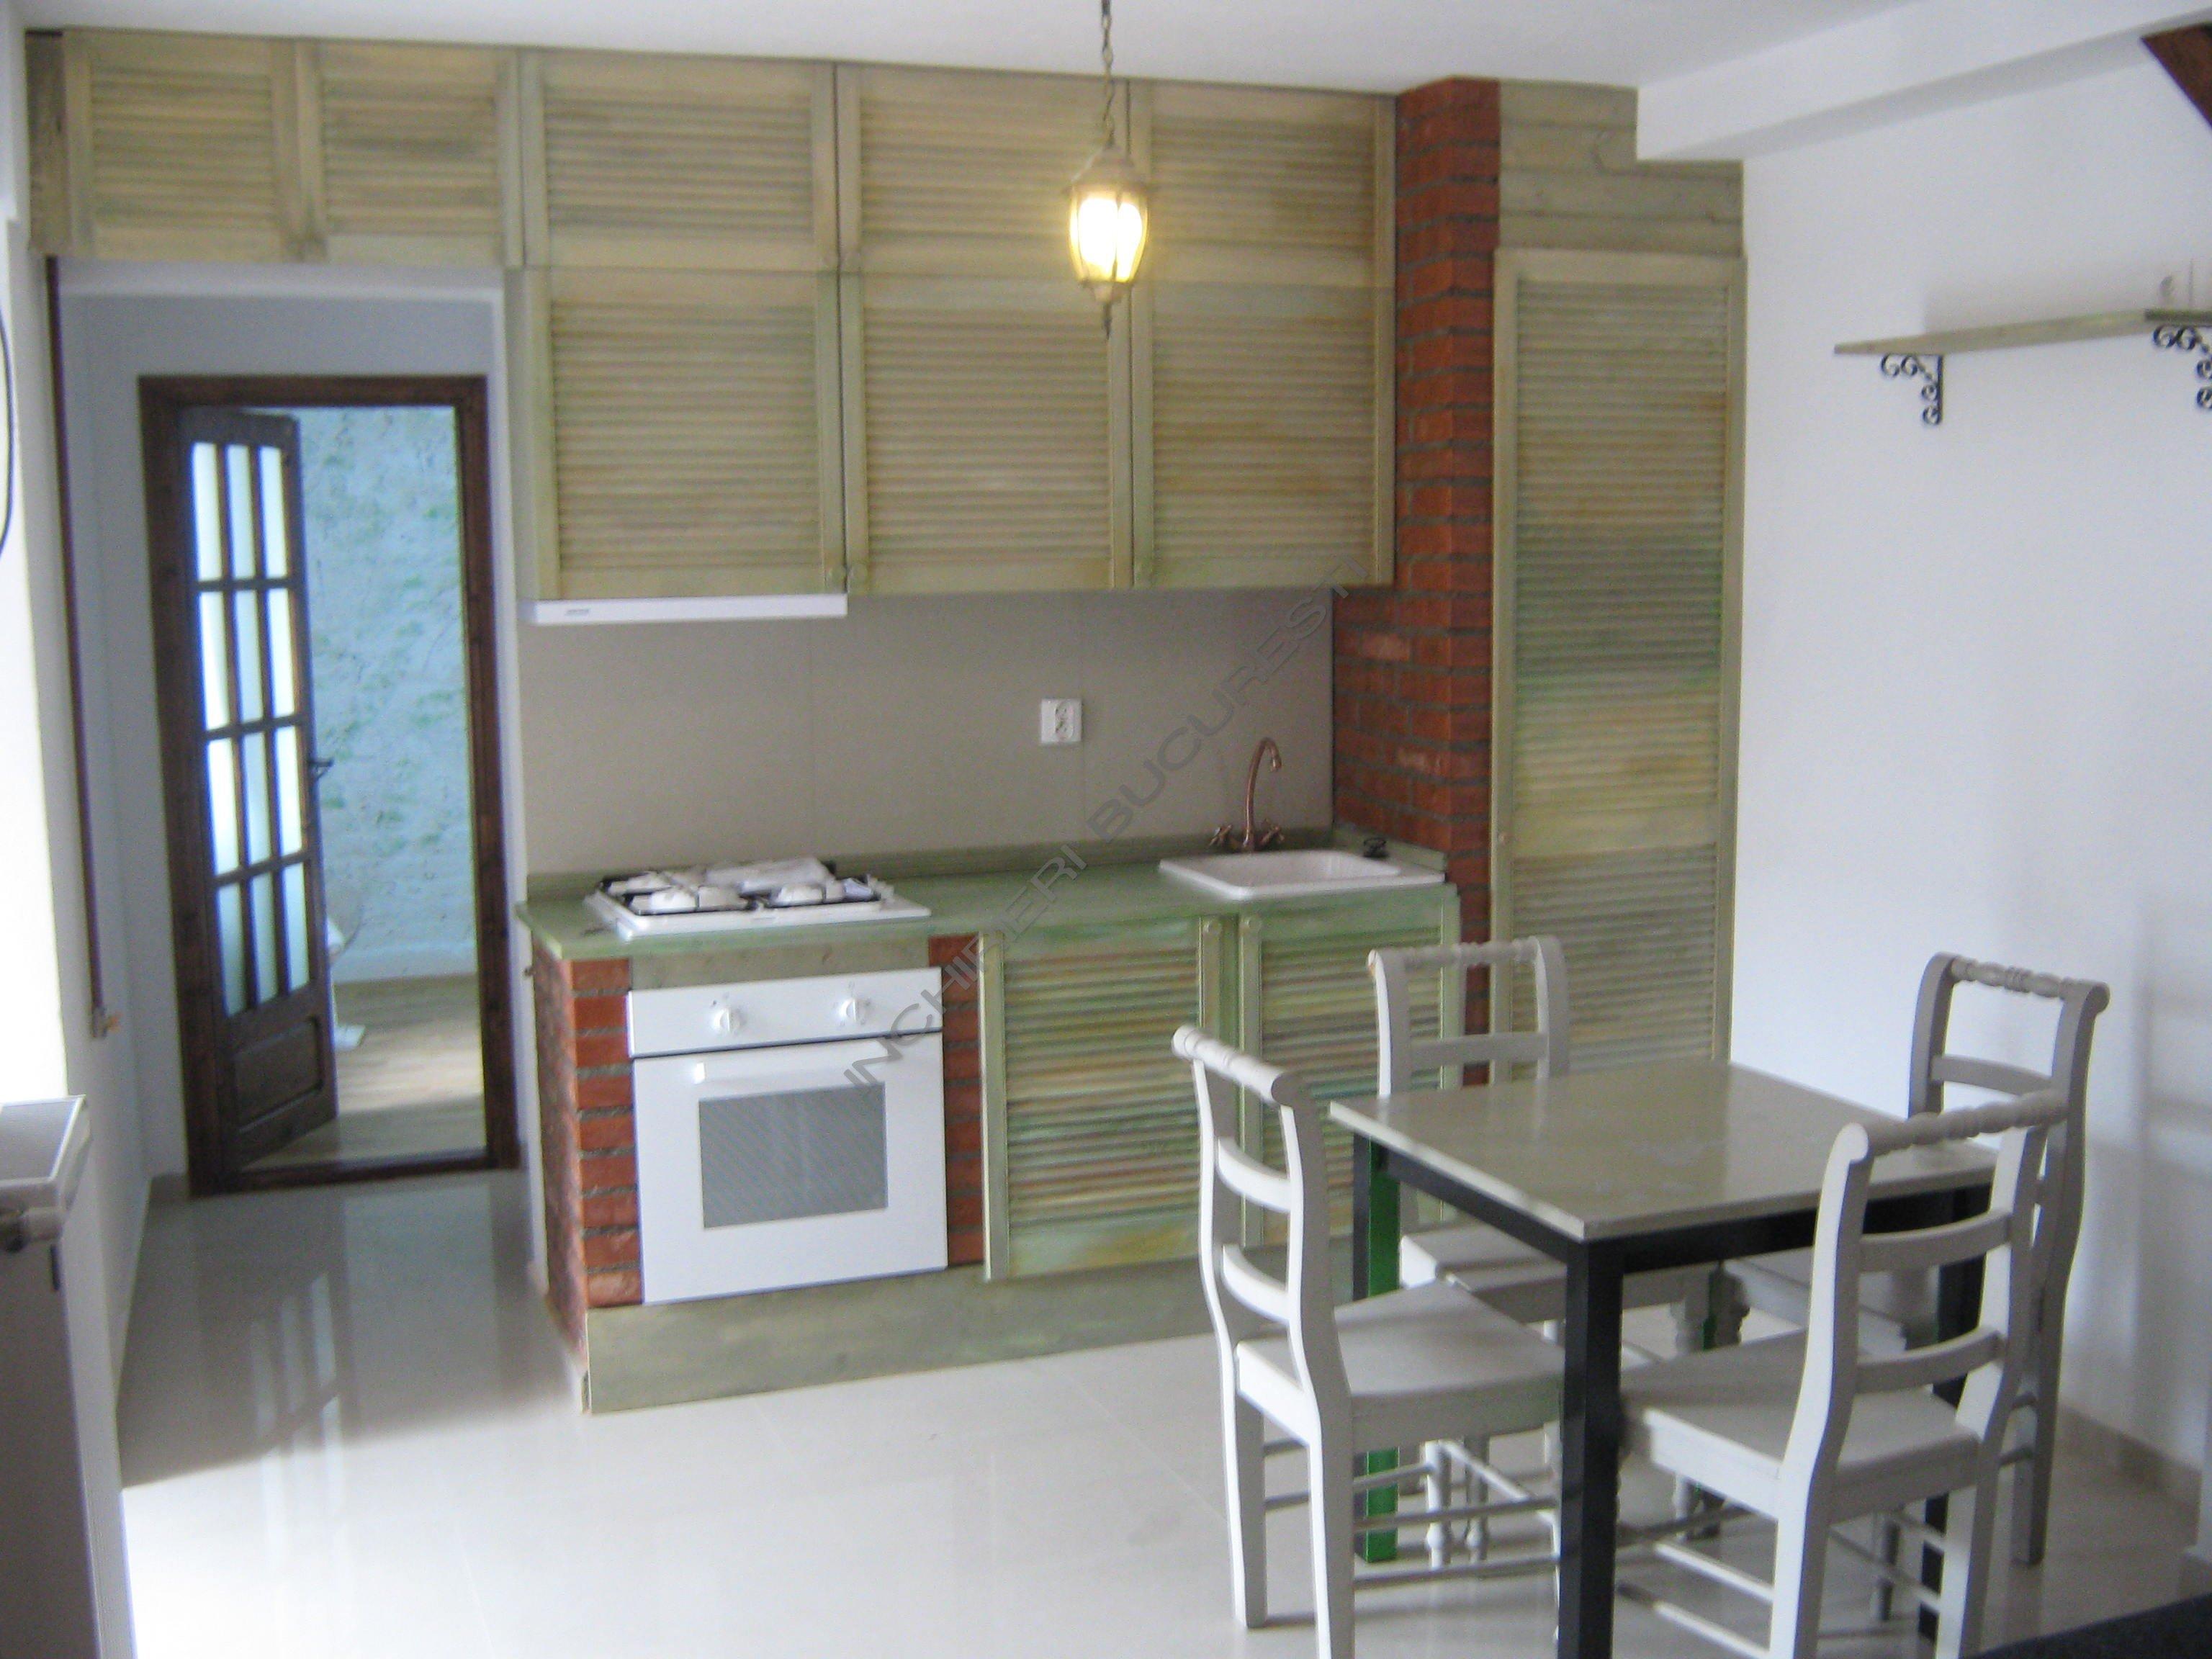 bucatarie mobilata utilata apartament banu manta